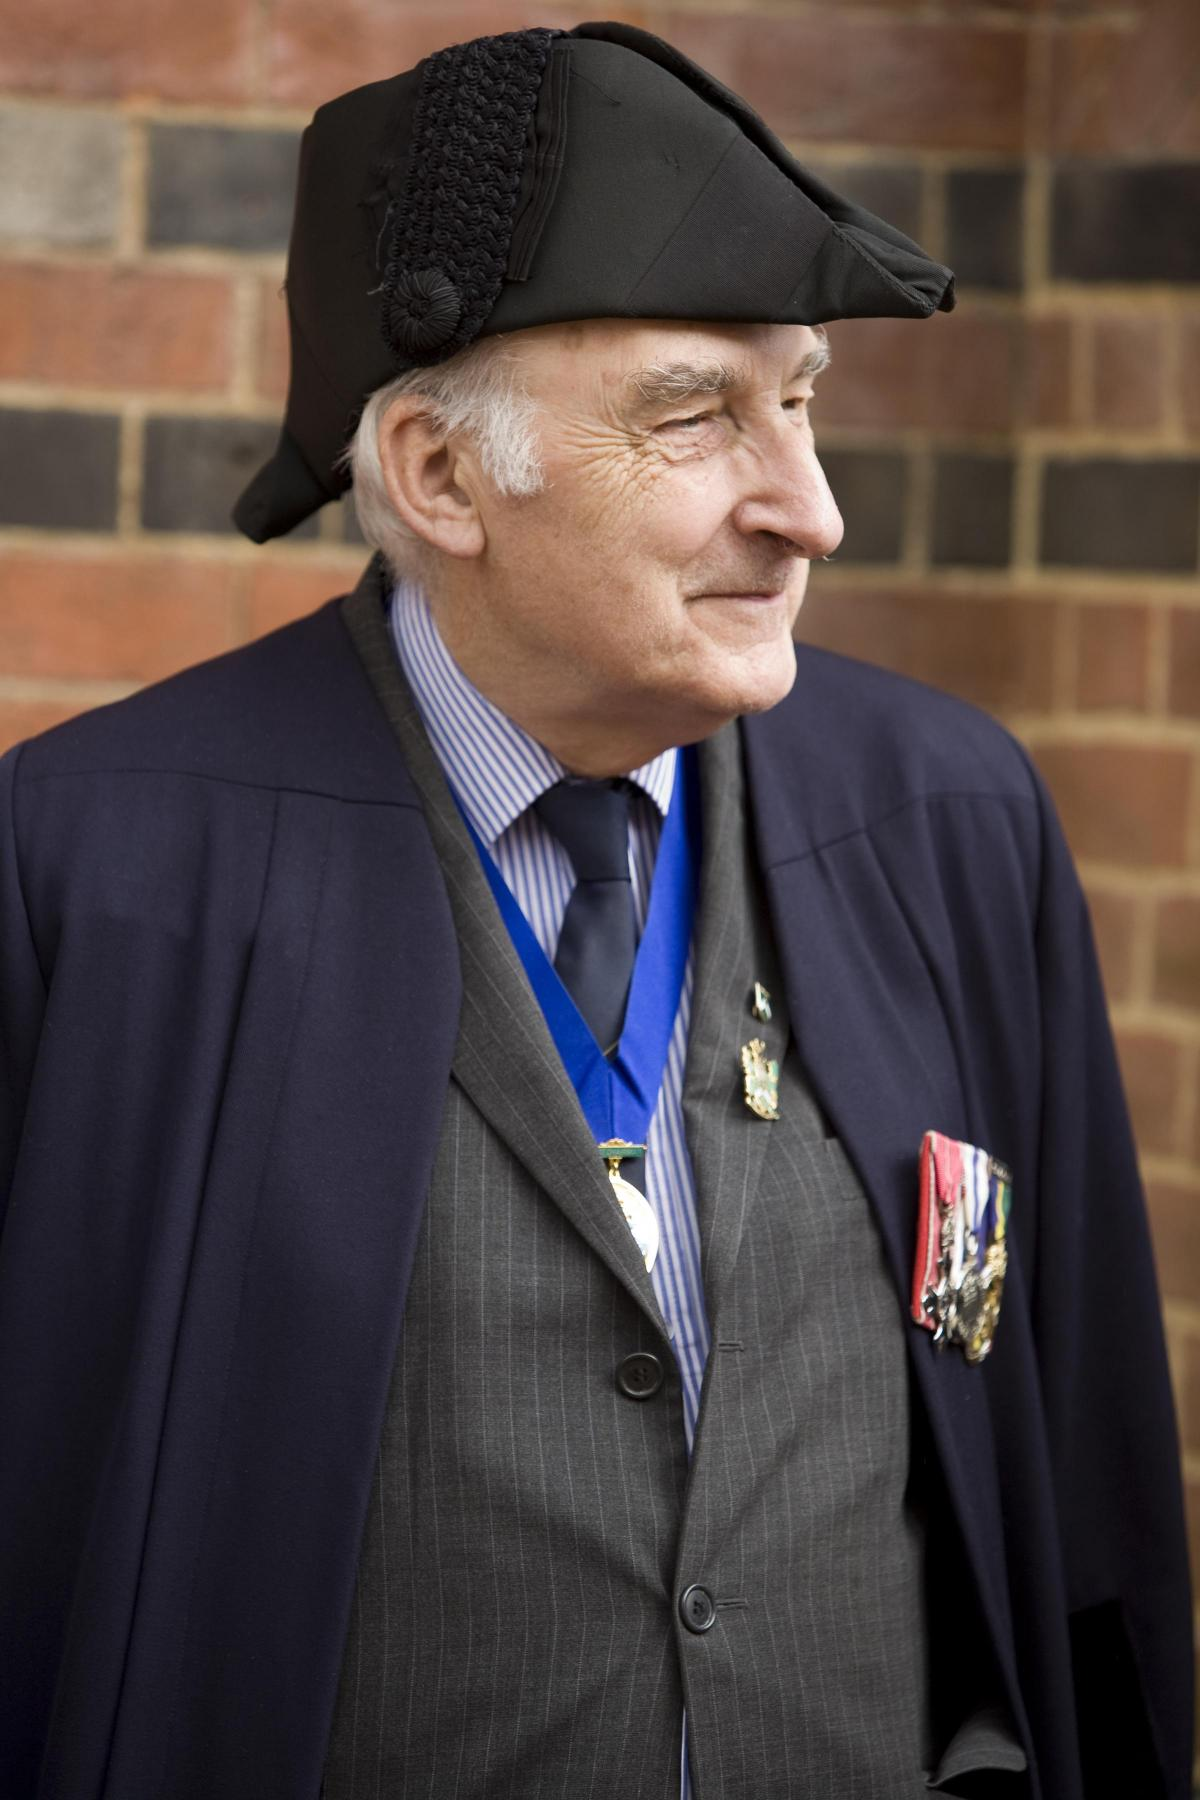 Councillor Robert Wyatt Served Wokingham Borough Council For Over 50